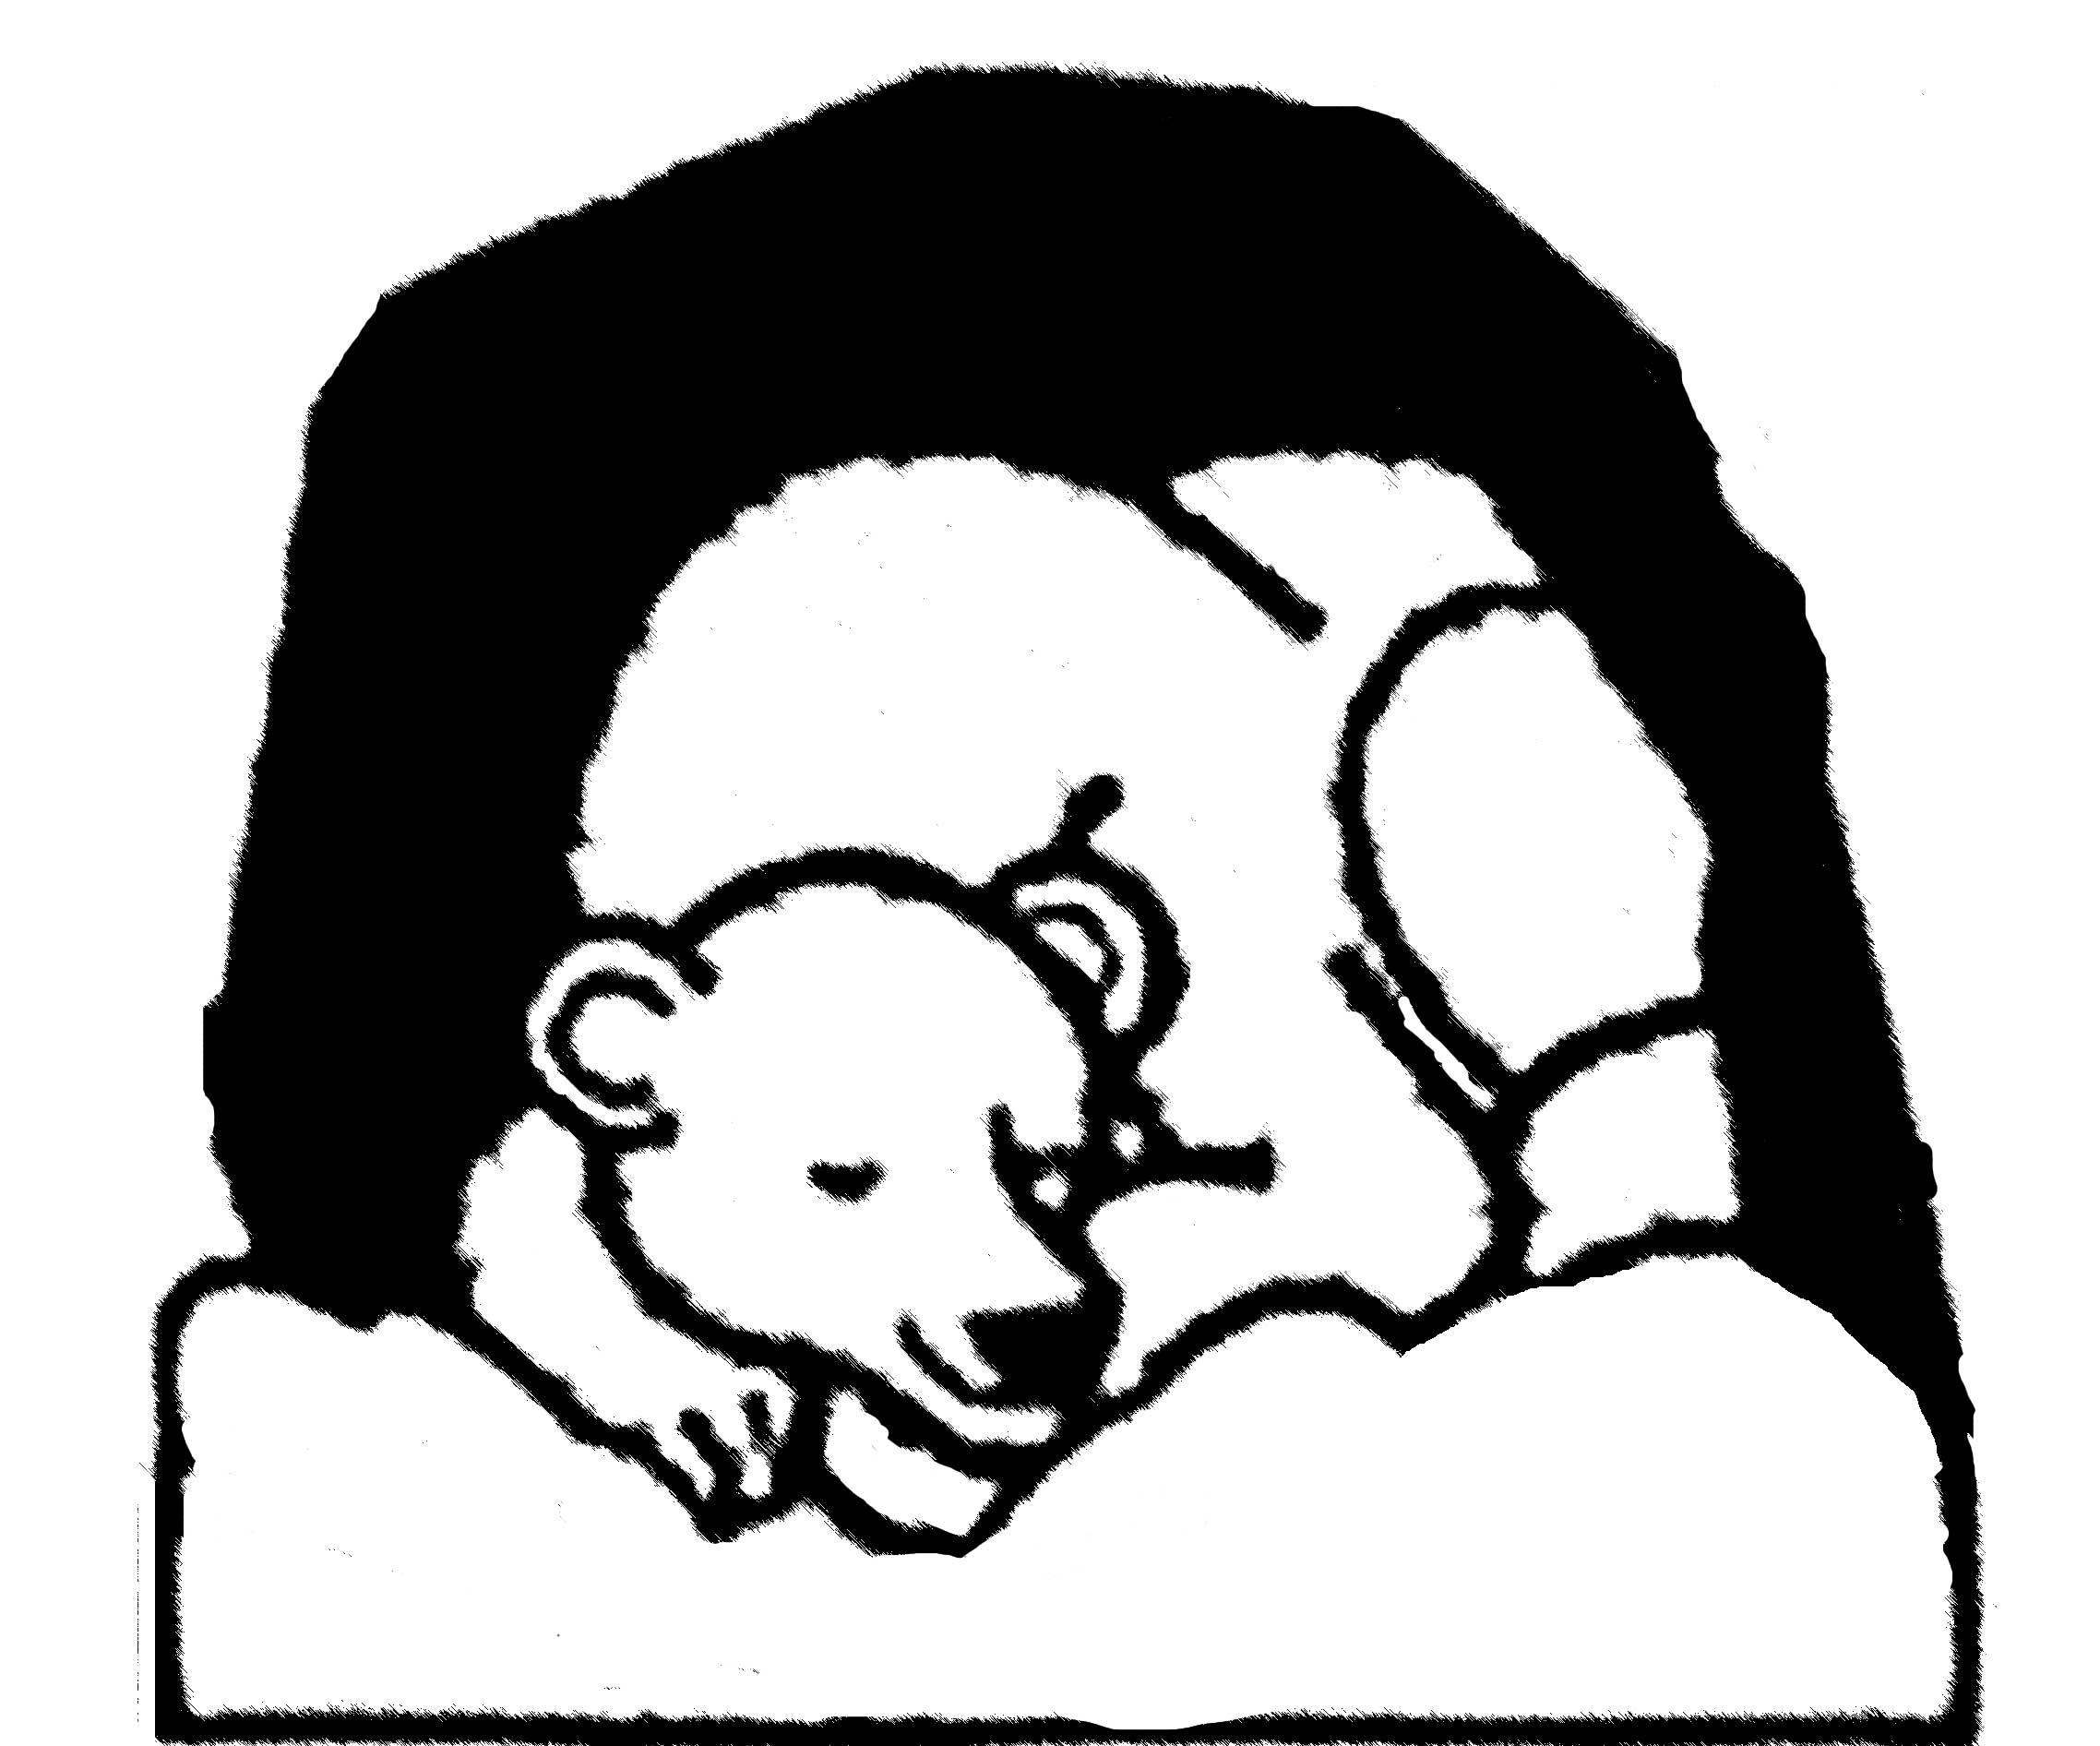 Cave clipart den. Clip art viewing panda